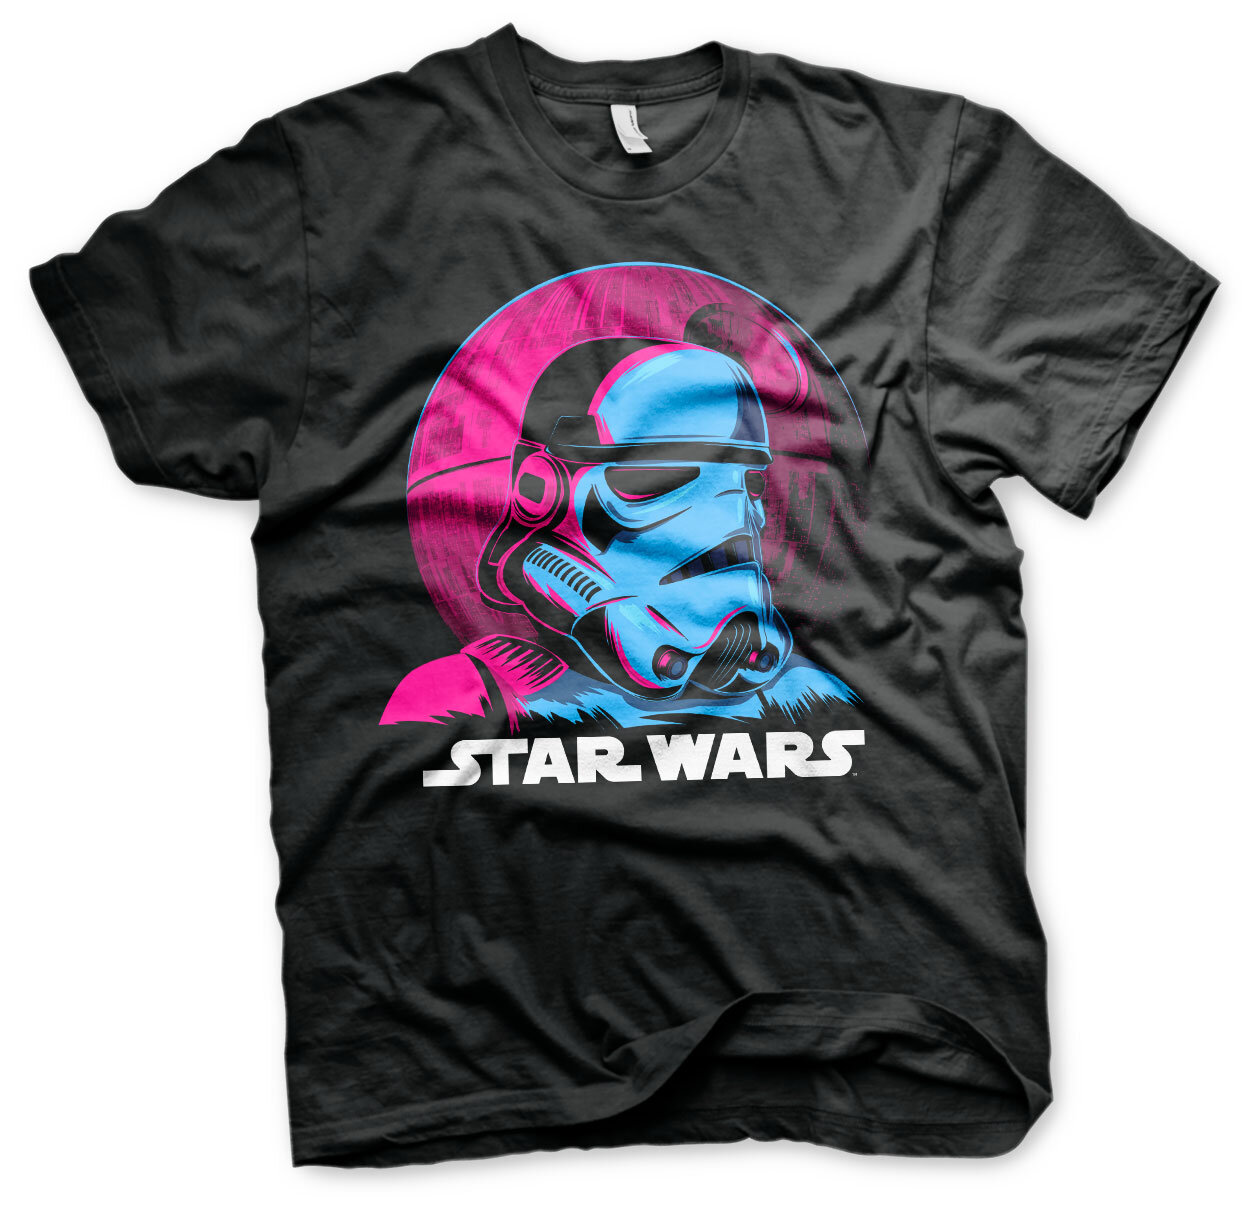 Star Wars - Colorful Trooper T-Shirt